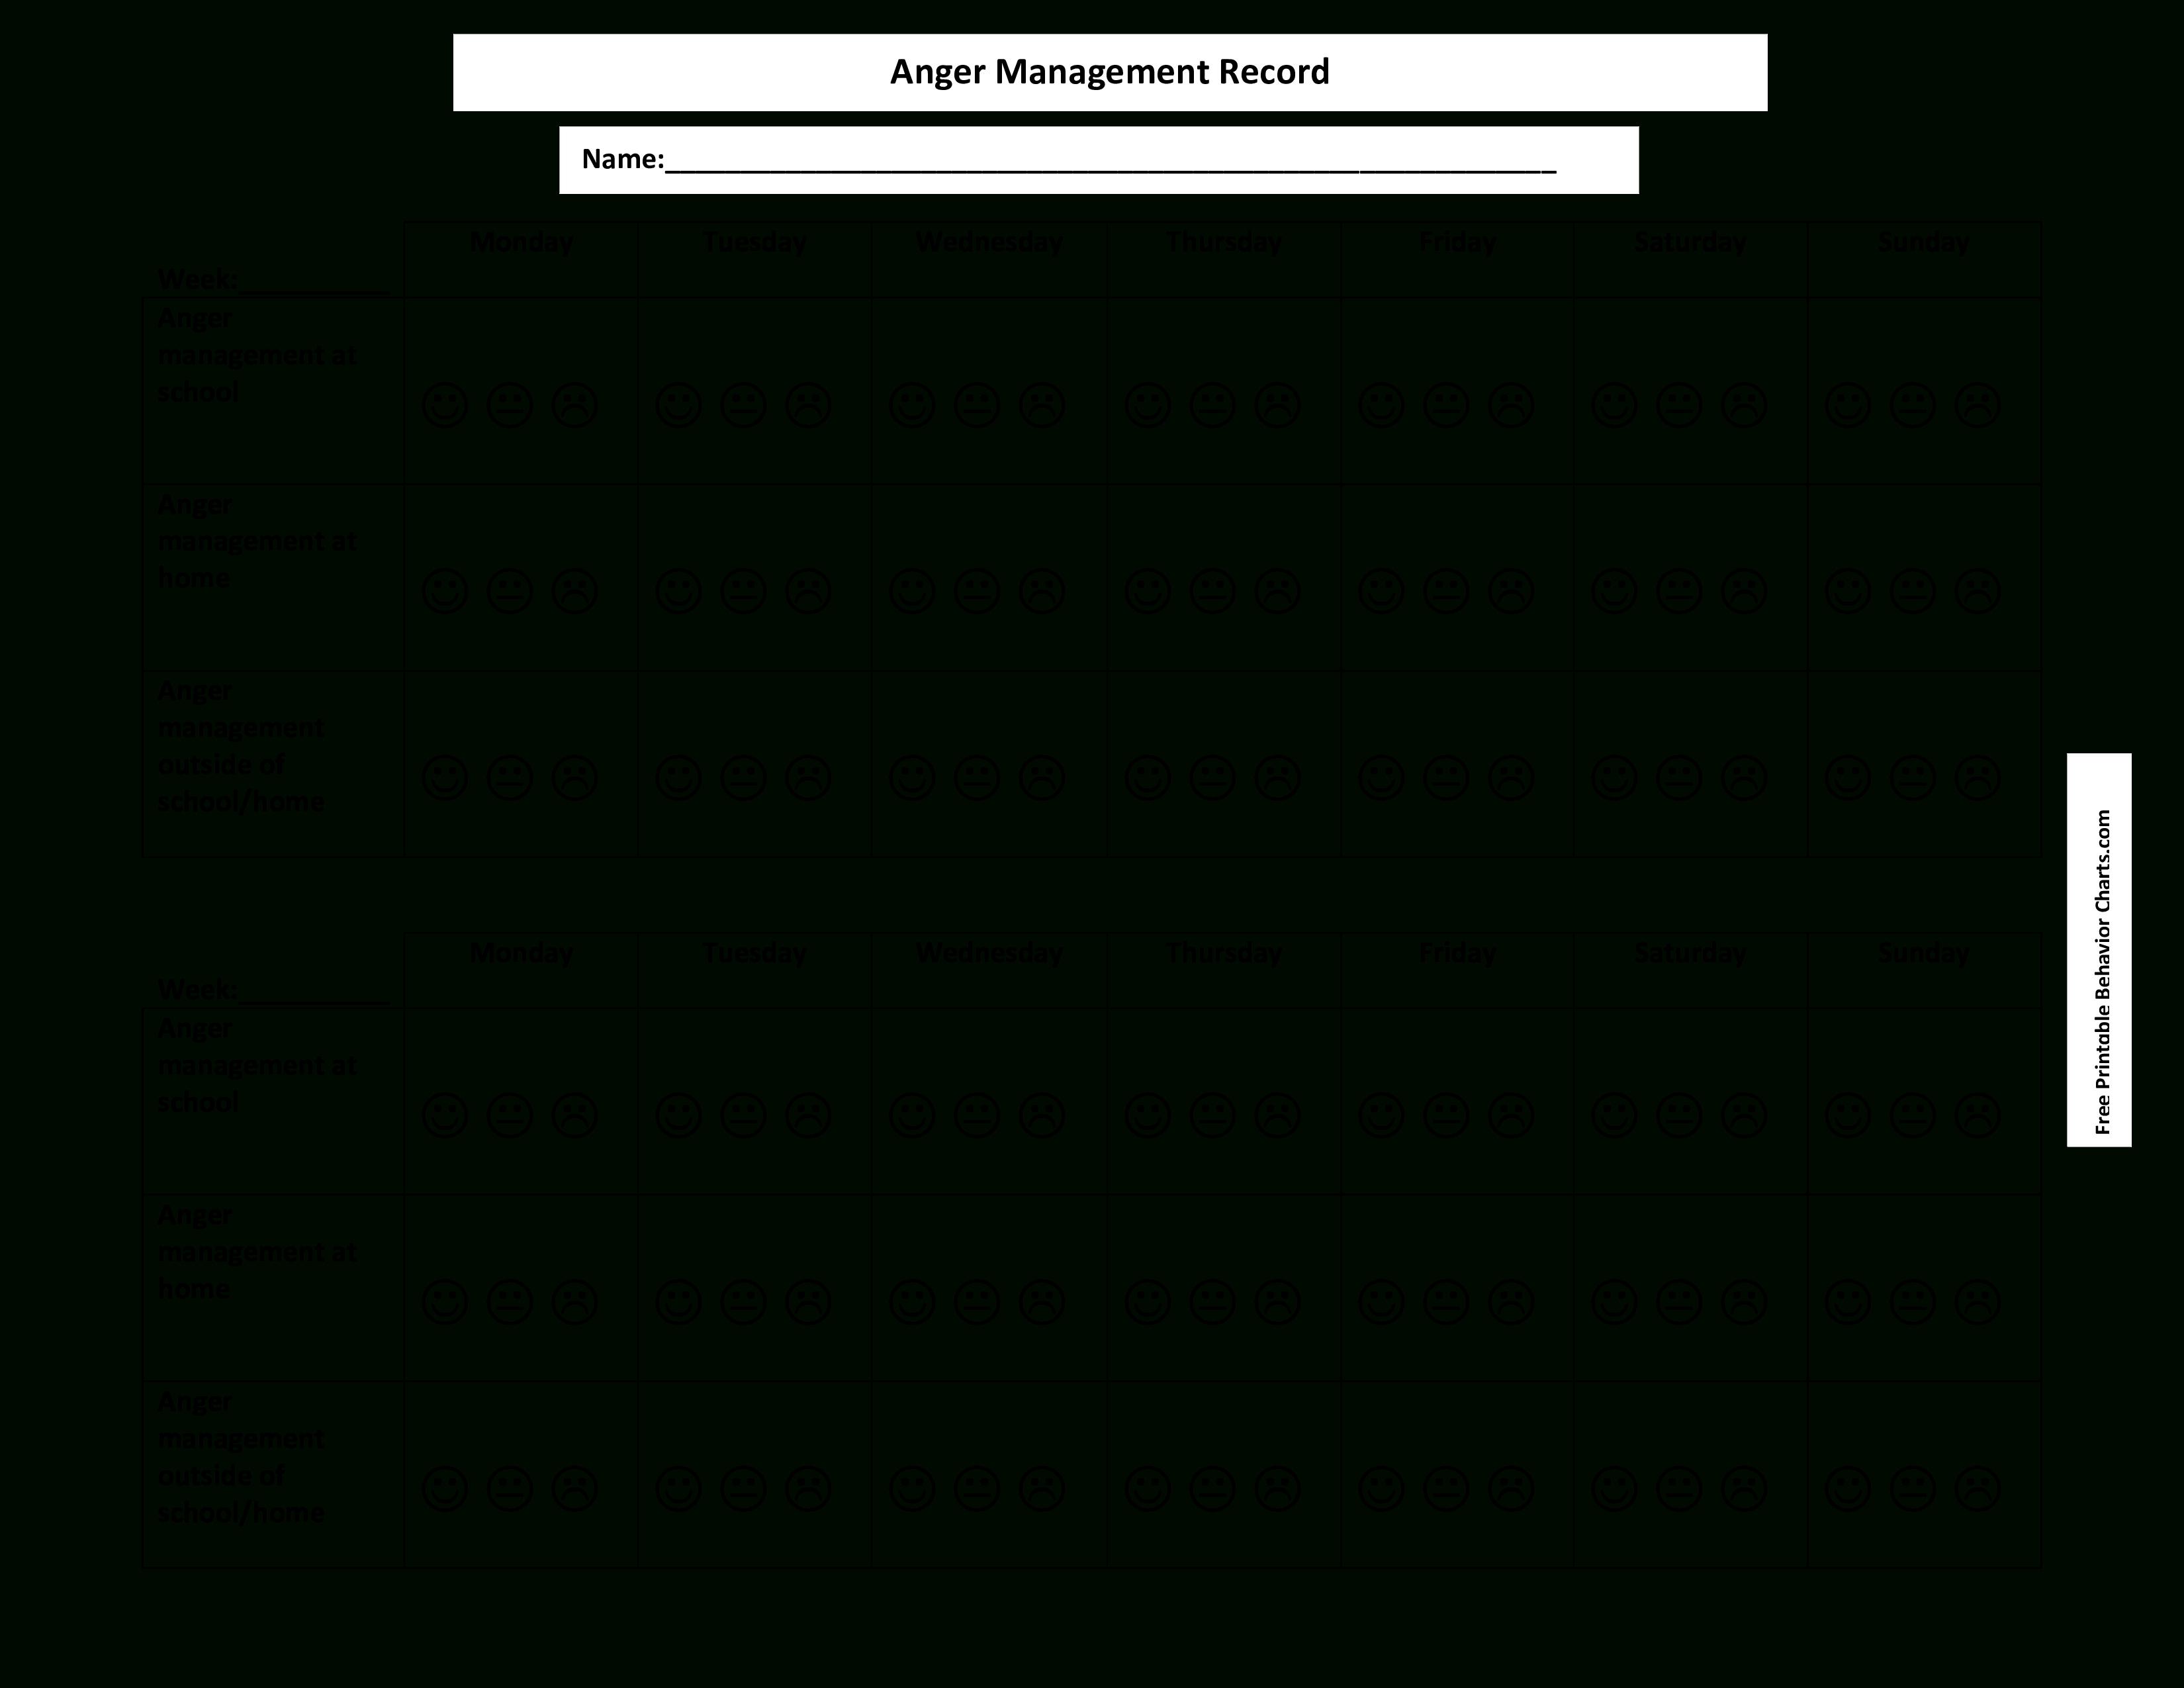 Free Printable Behavior Management Chart | Templates At - Free Printable Behavior Charts